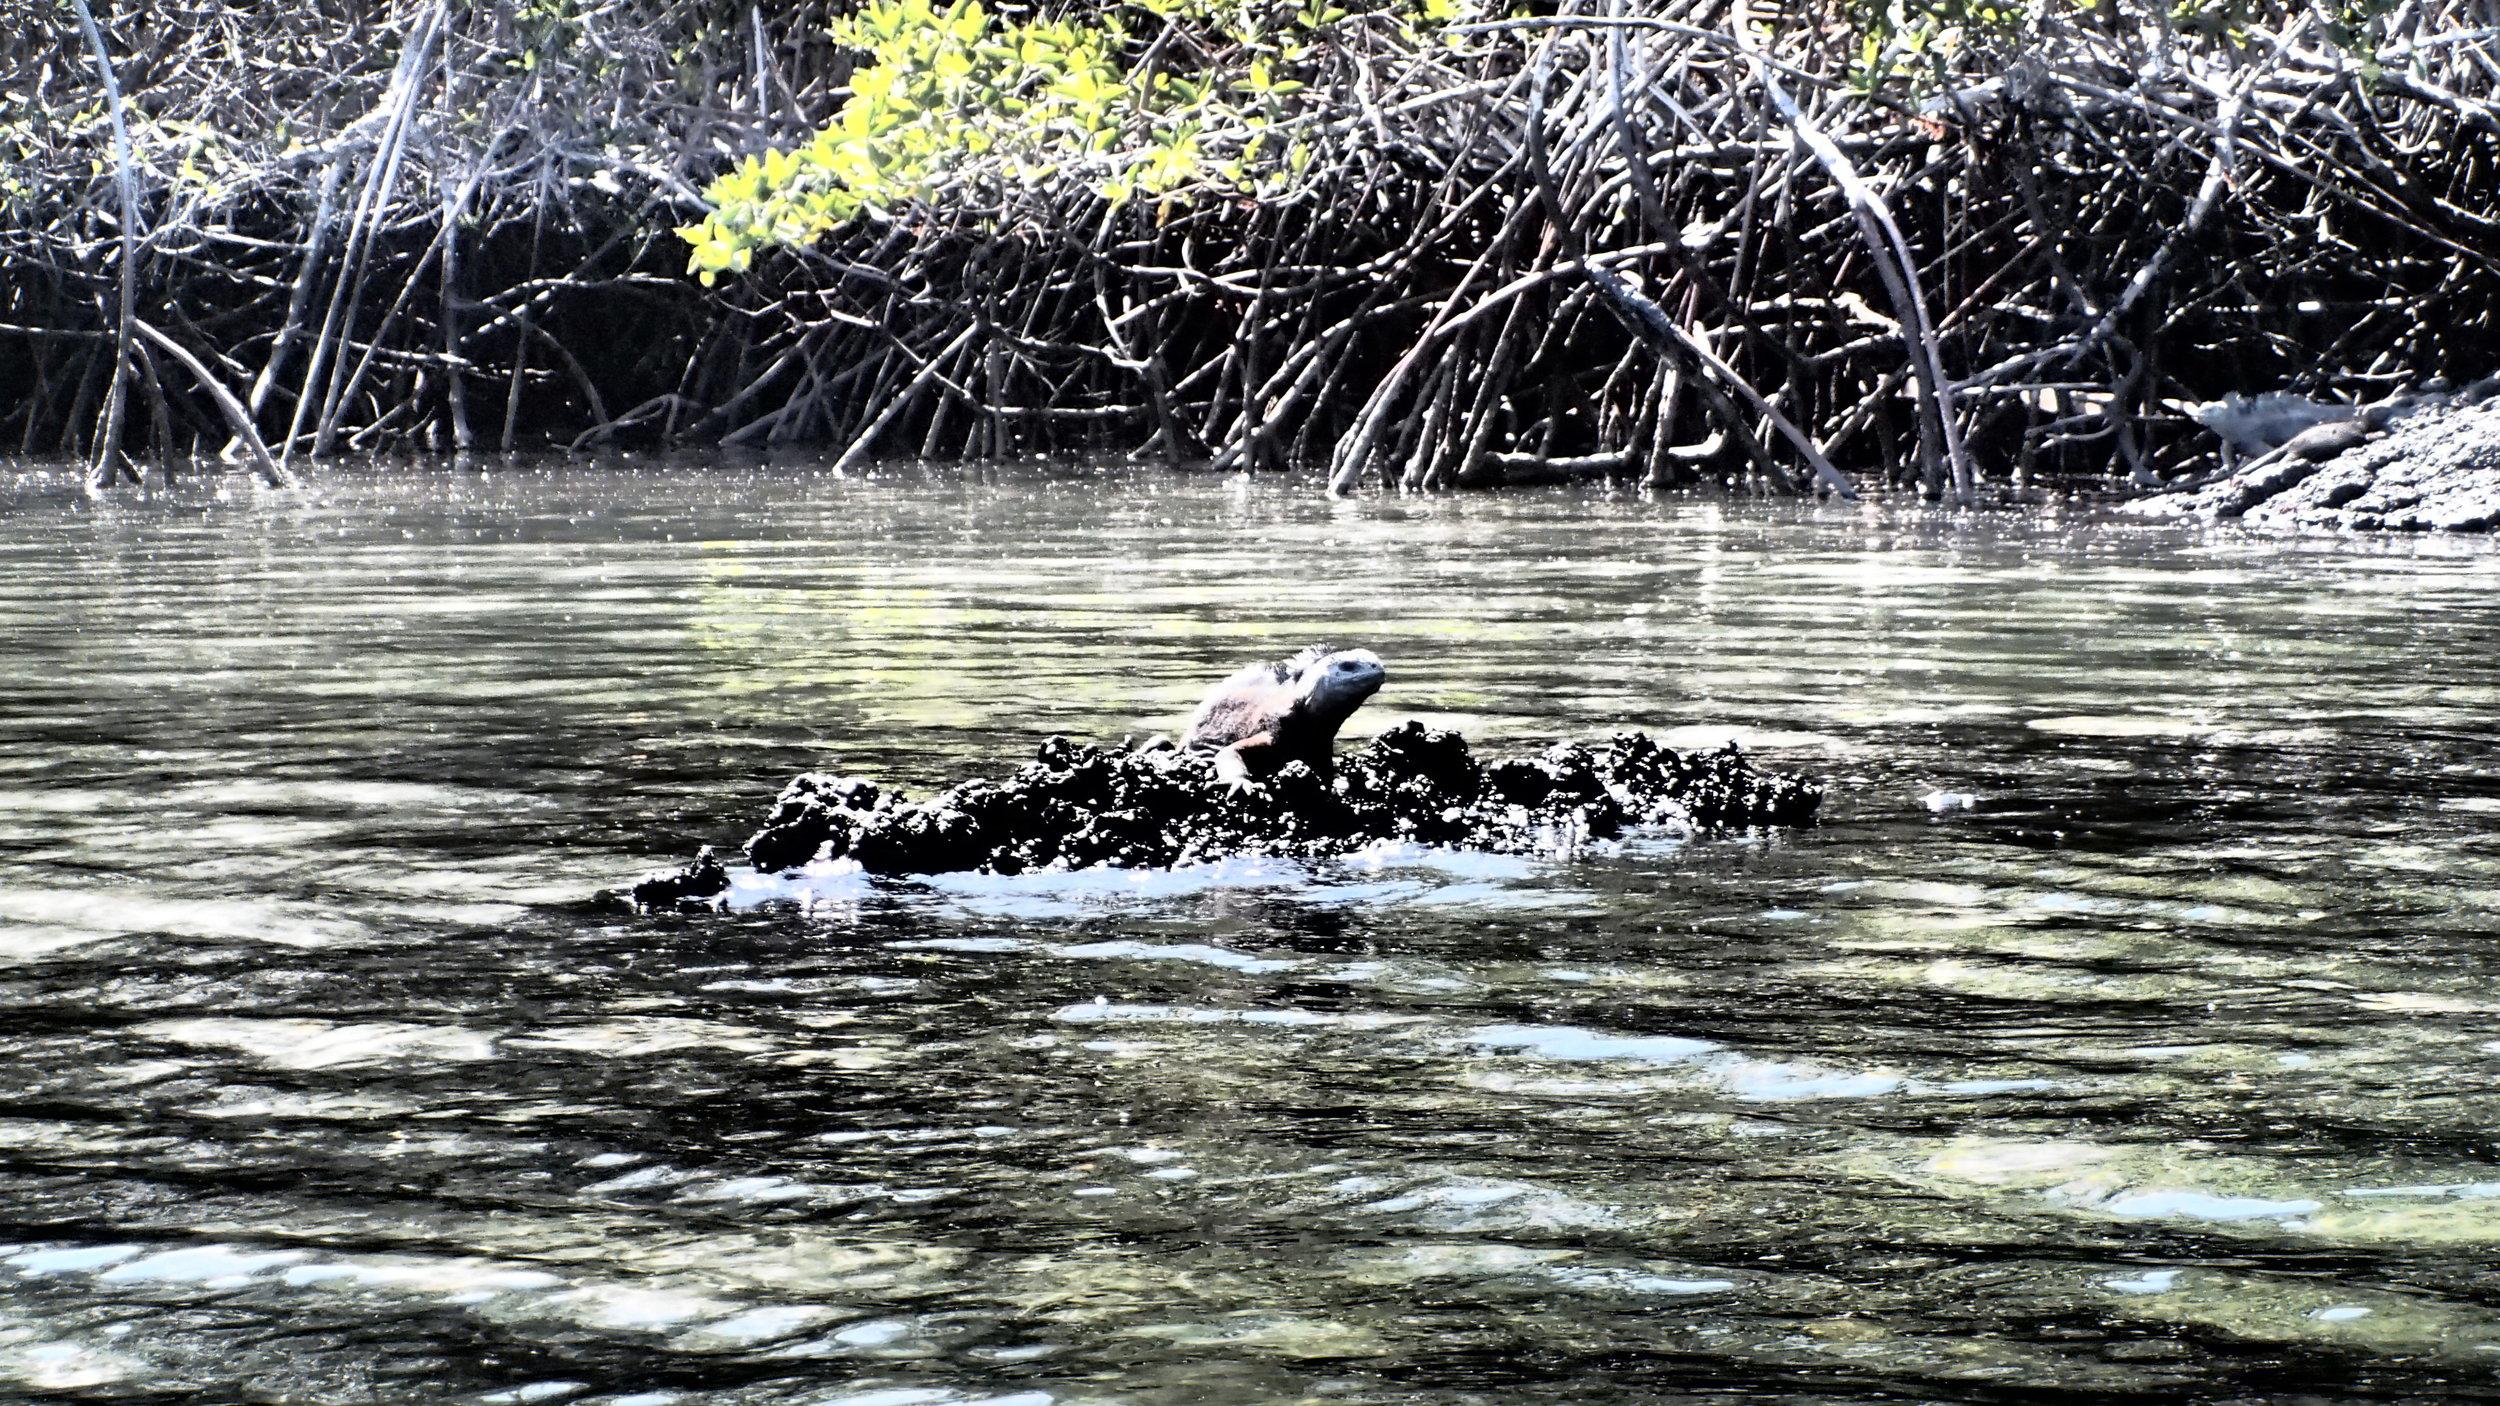 Marine iguana, Floreana Island, The galapagos